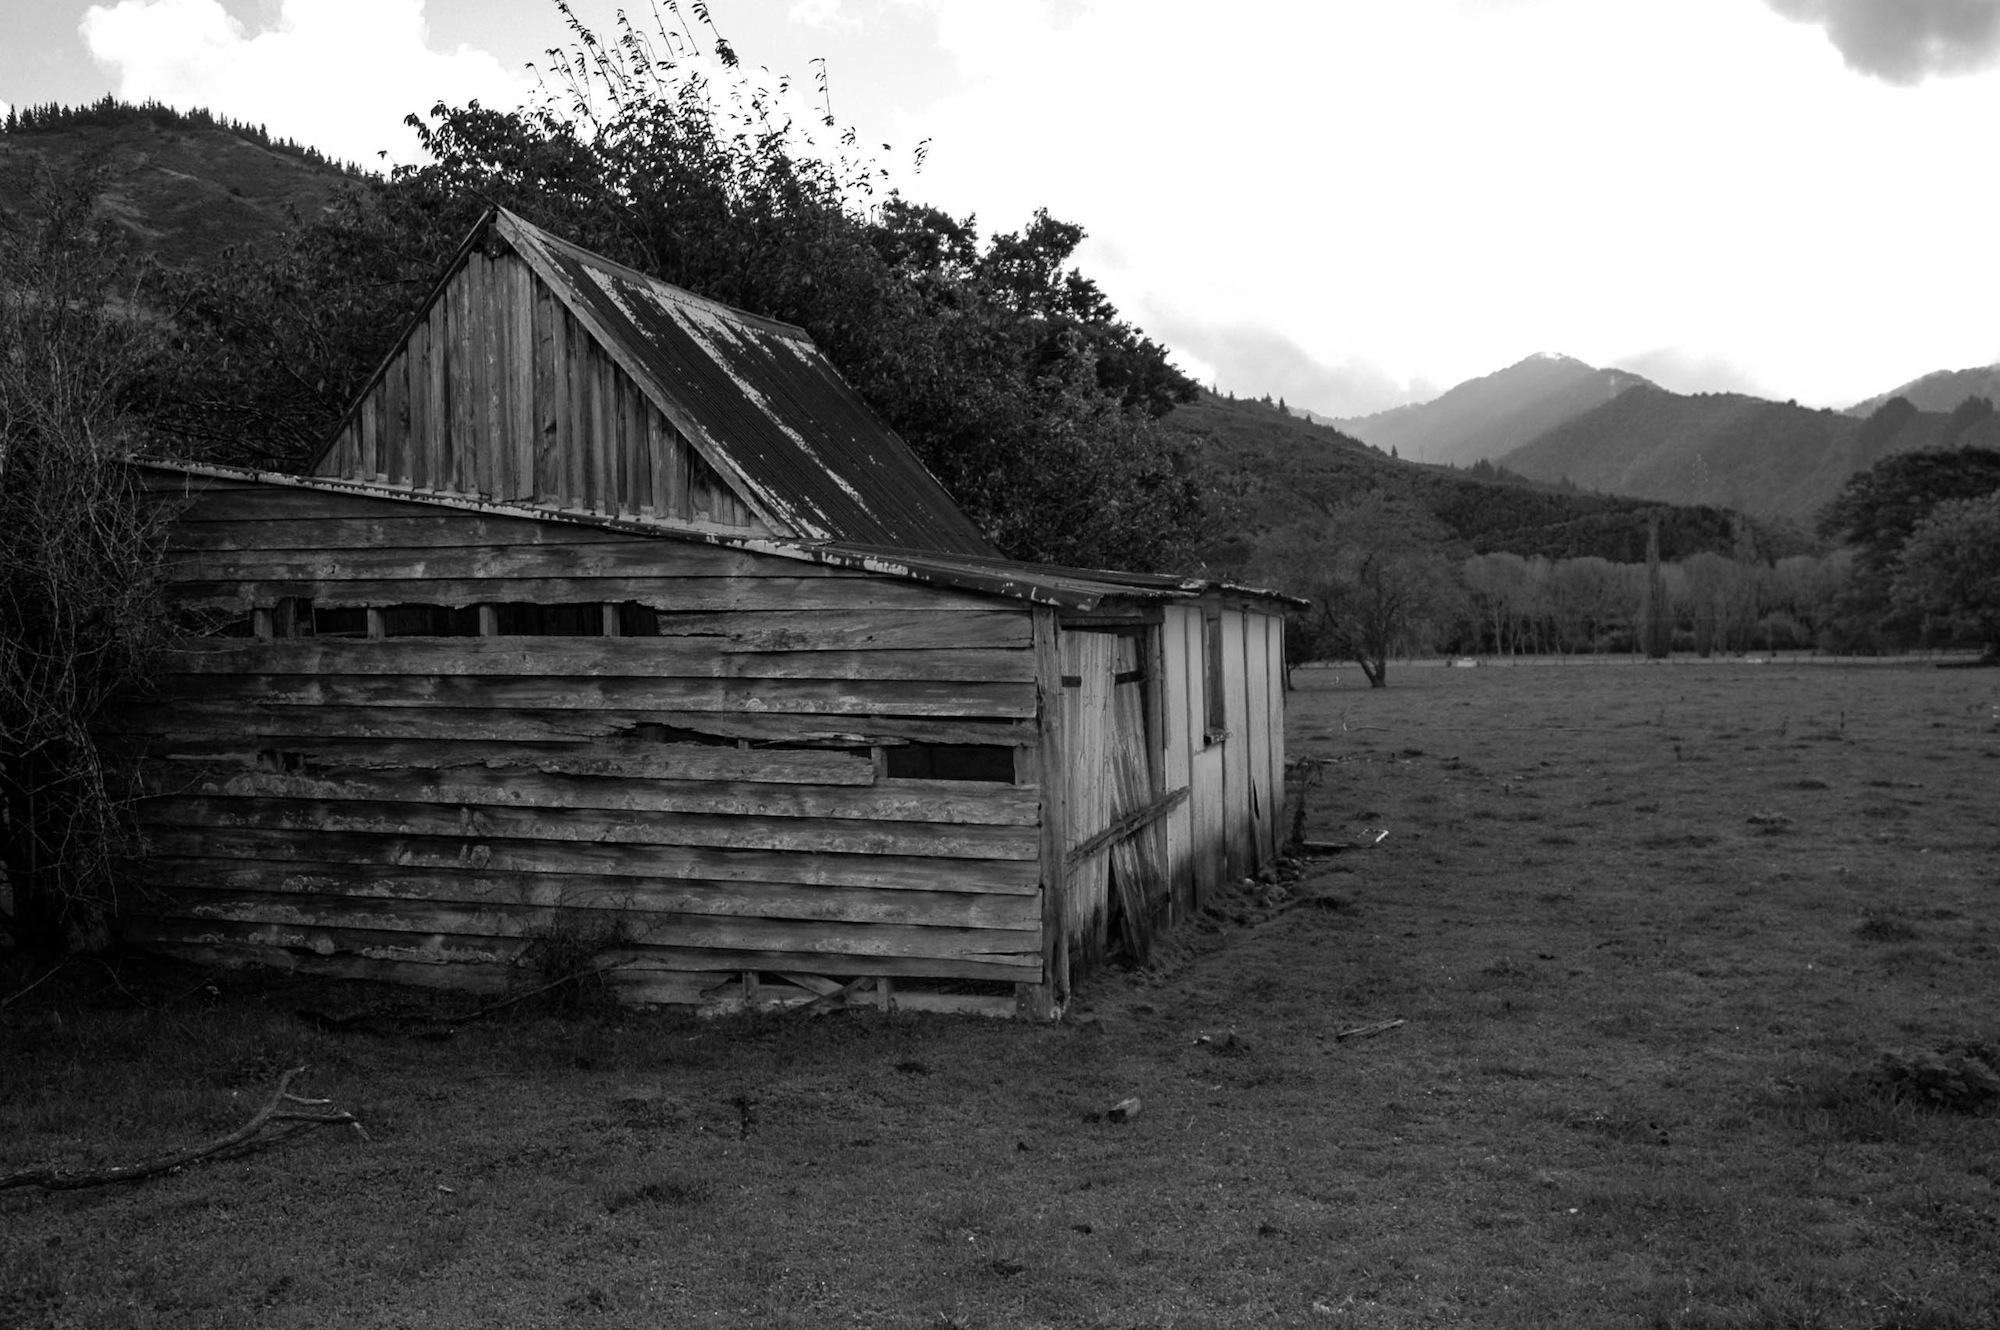 abandoned_house_new zealand_ben_howe_9.jpg